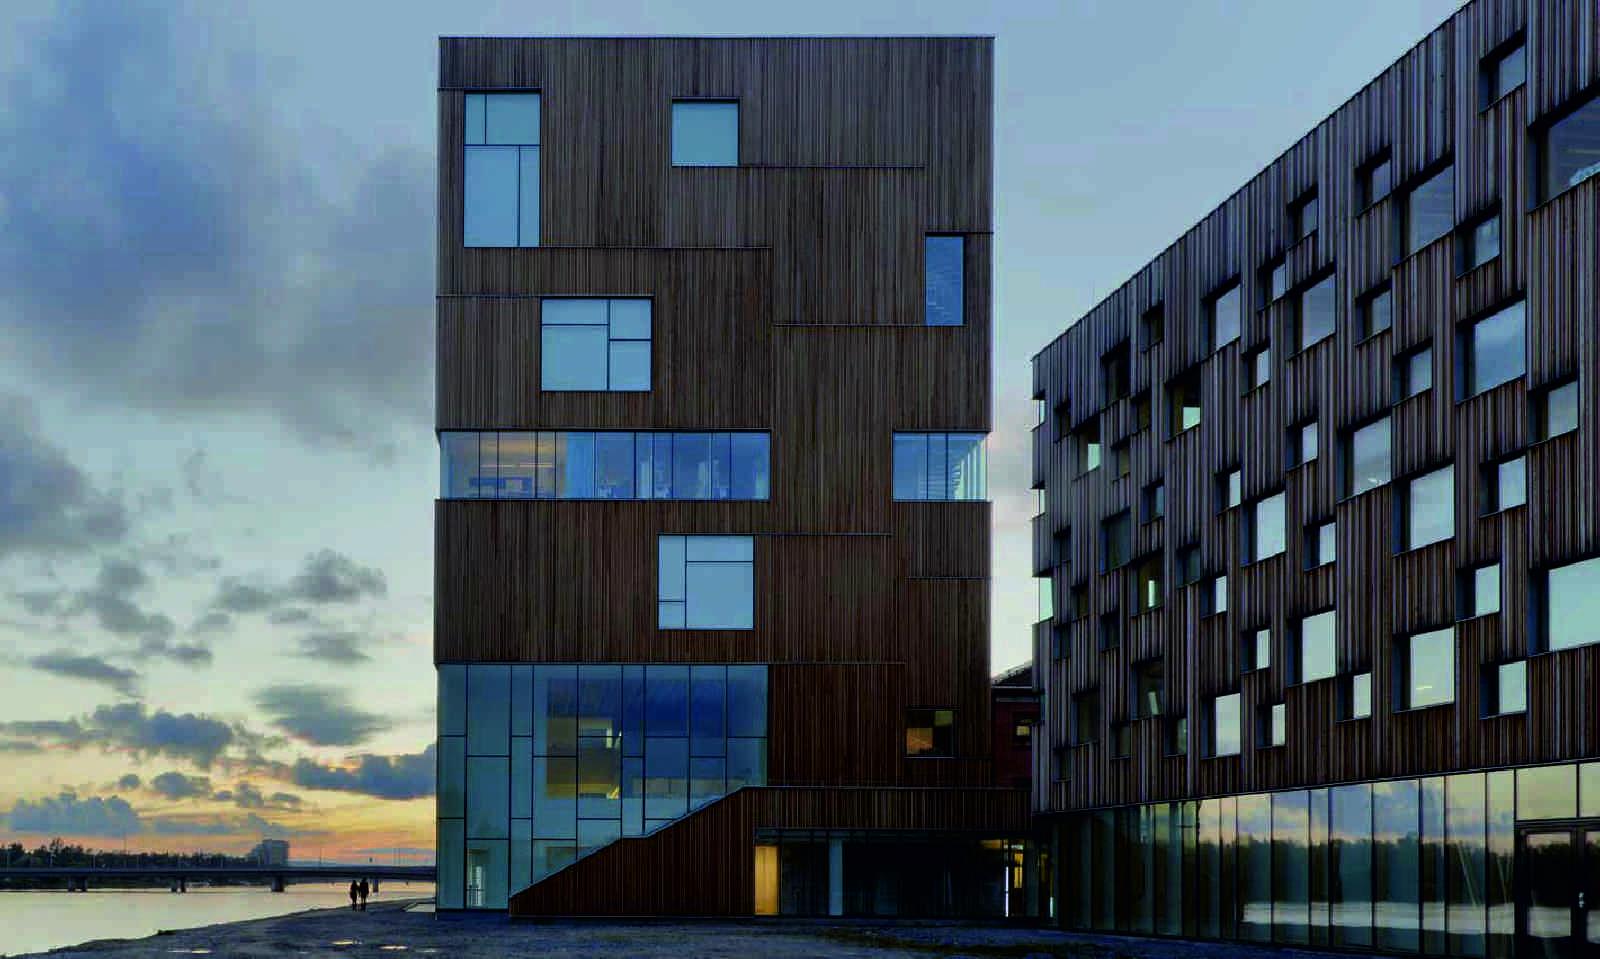 detaljerad look rabattkod ny produkt UMEÅ ART MUSEUM BY HENNING LARSEN ARCHITECTS – aasarchitecture